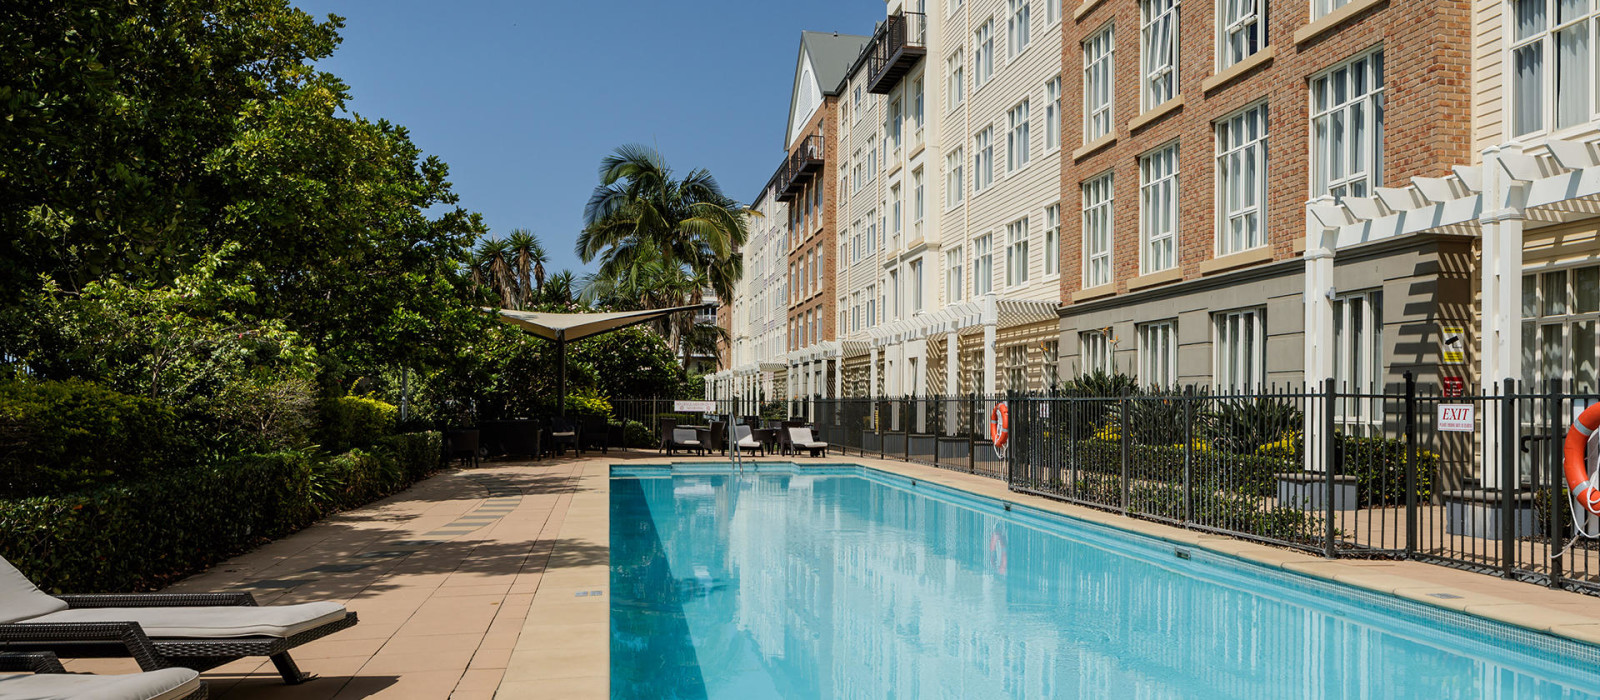 Hotel Rydges Newcastle Australia